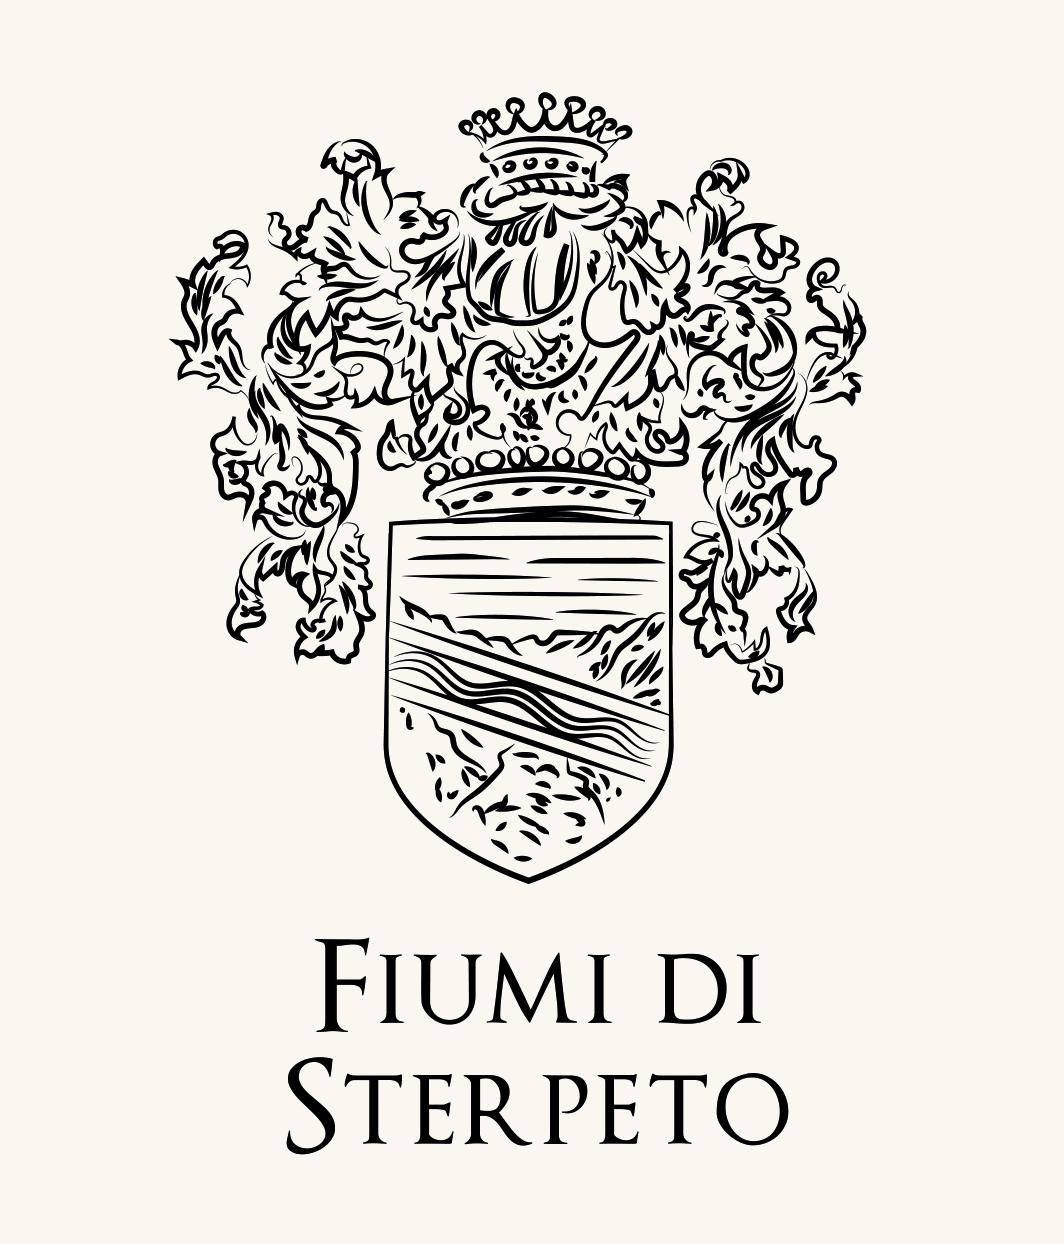 Family crest of Fiumi di Sterpeto, noble umbrian family